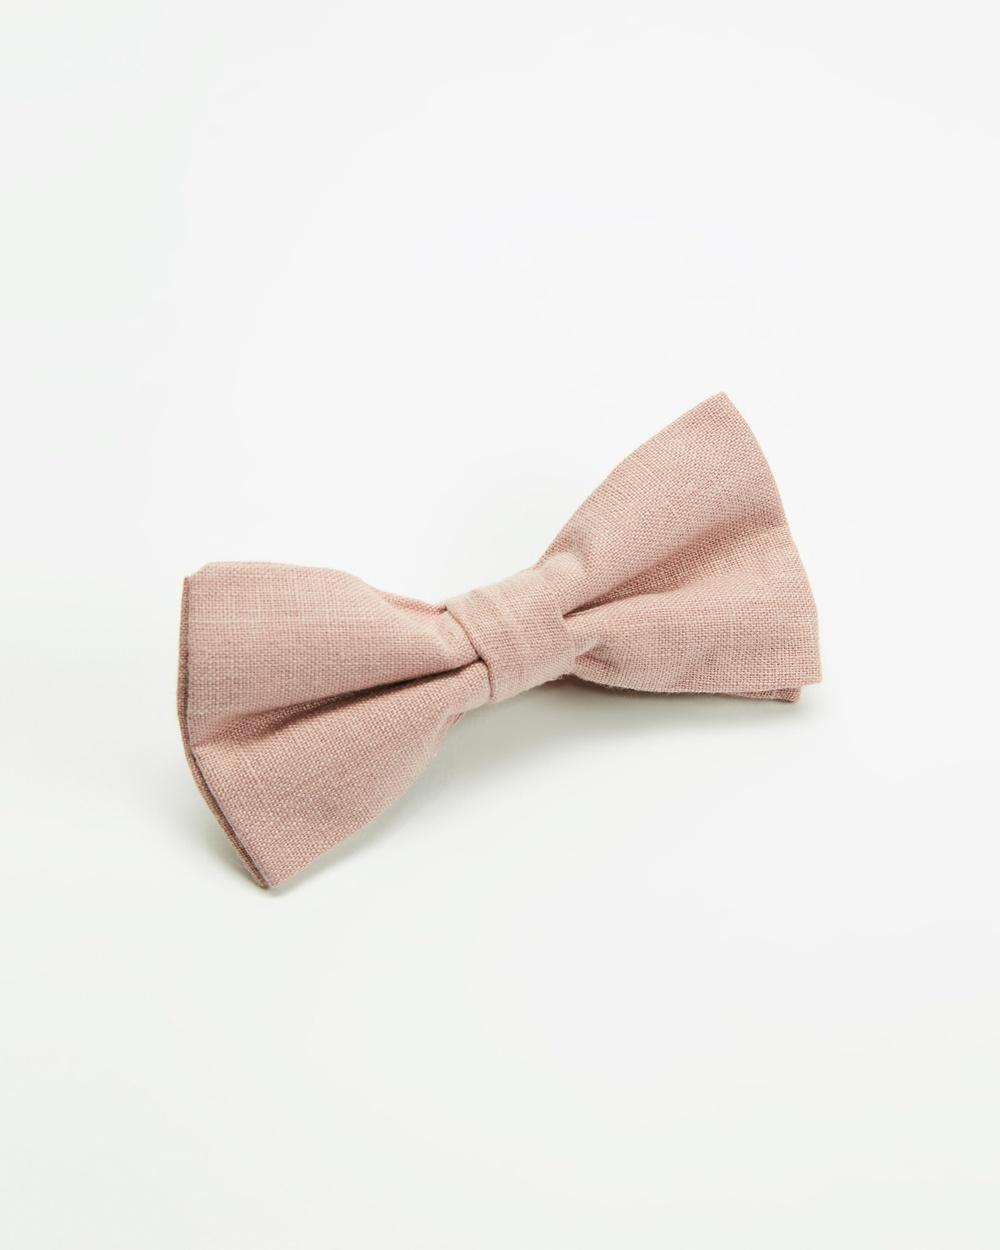 AERE Bow Tie Ties & Cufflinks Pink